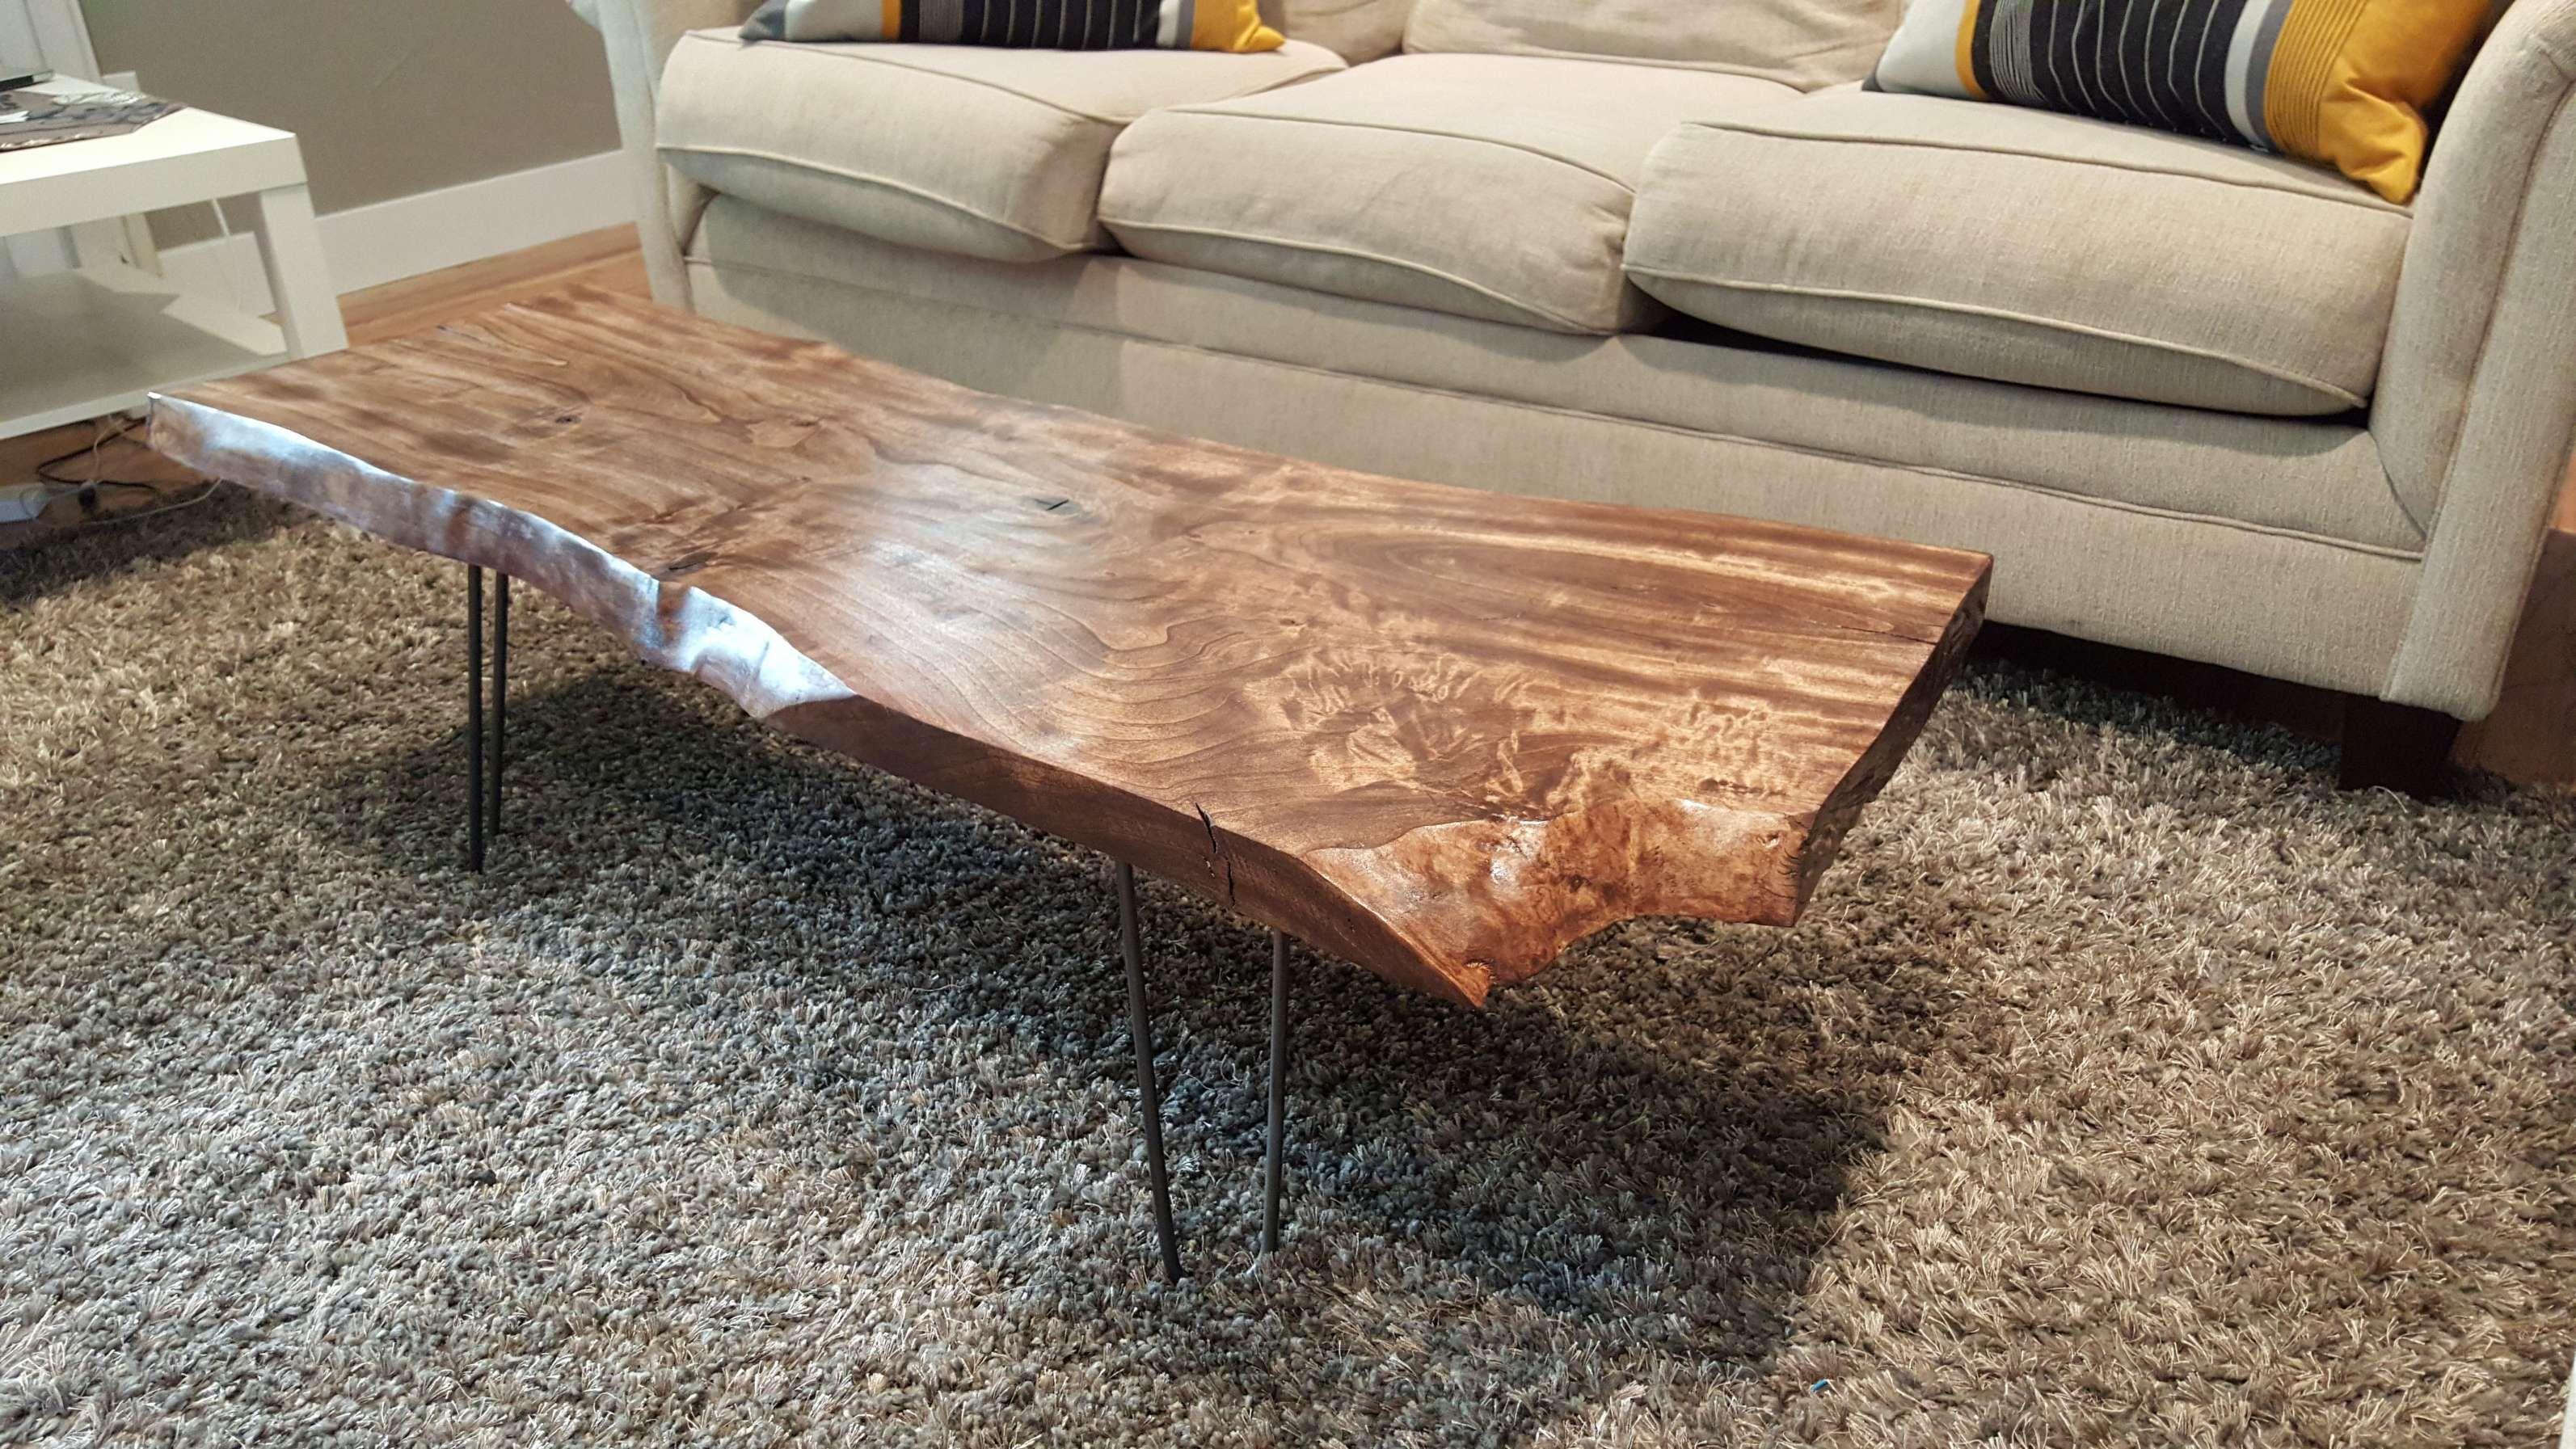 12 Splendid Raw Edge Wood Coffee Table Photos Raw Wood Coffee Table Coffee Table Wood Wood Coffee Table Diy [ 1793 x 3187 Pixel ]